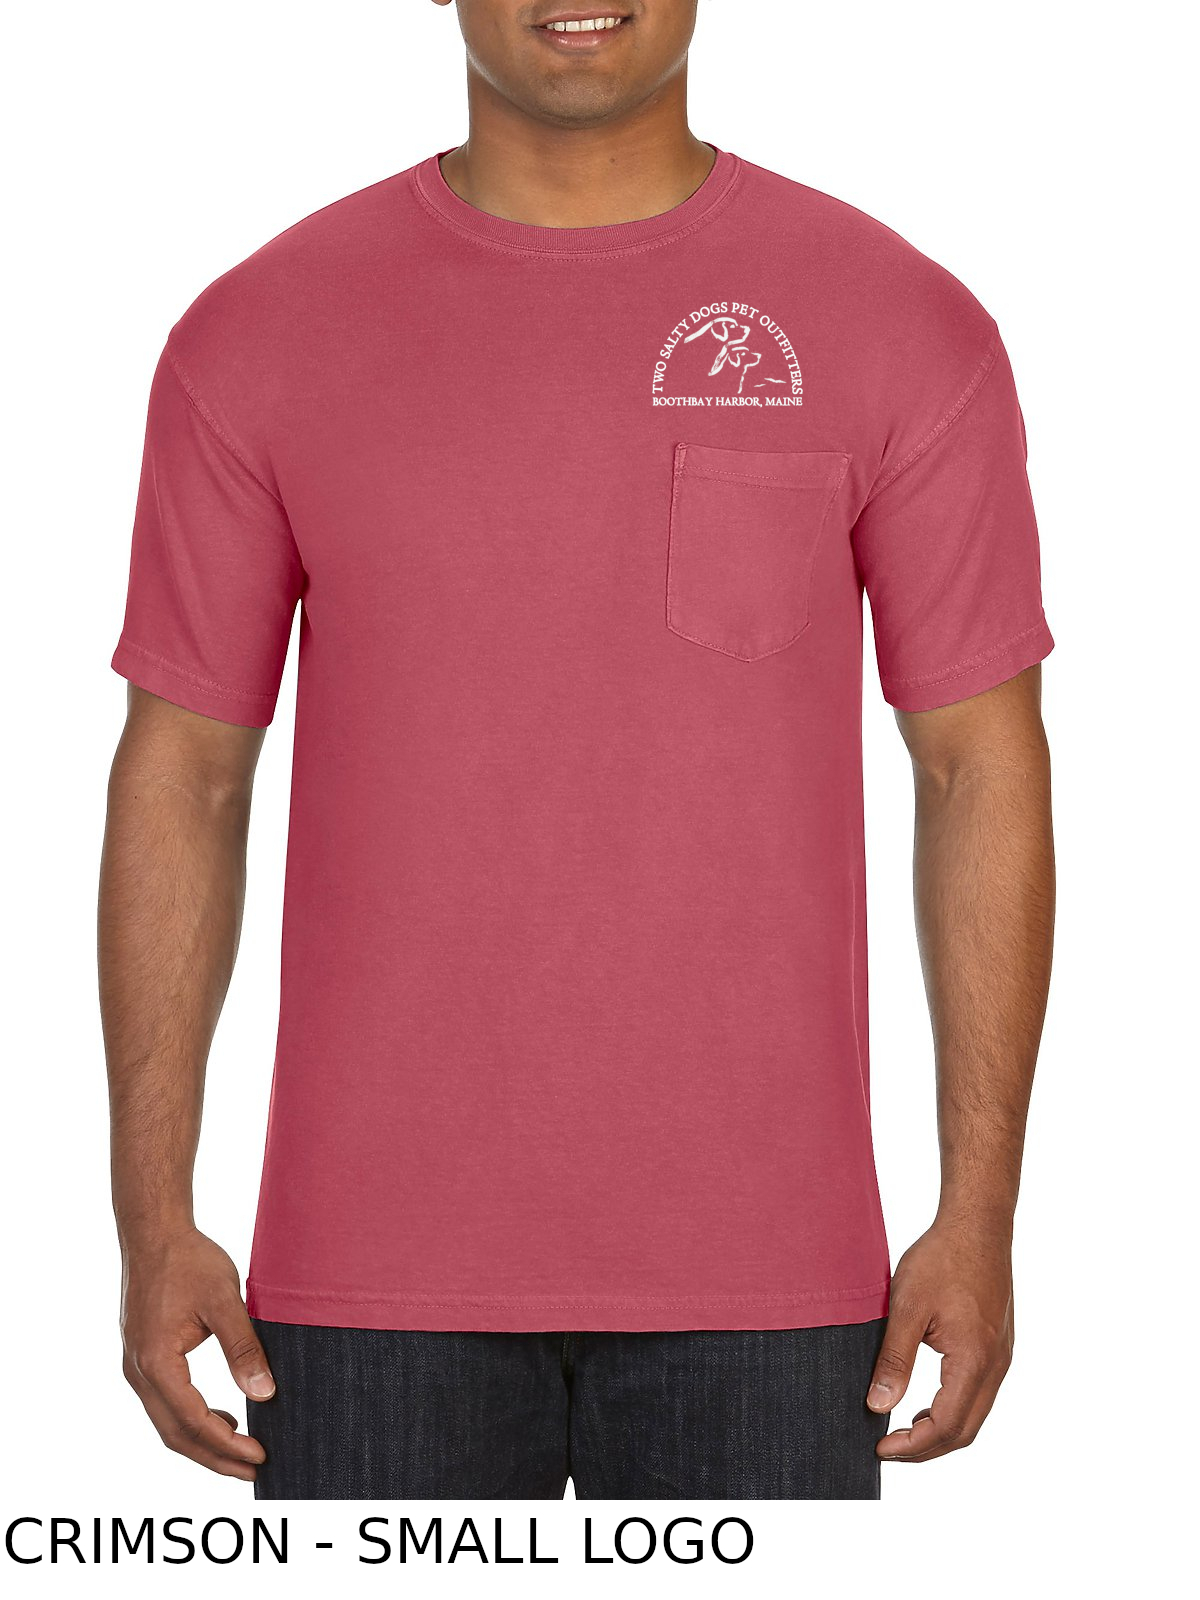 bbha-ss-t-shirt-pocket-crimson-front-small-logo